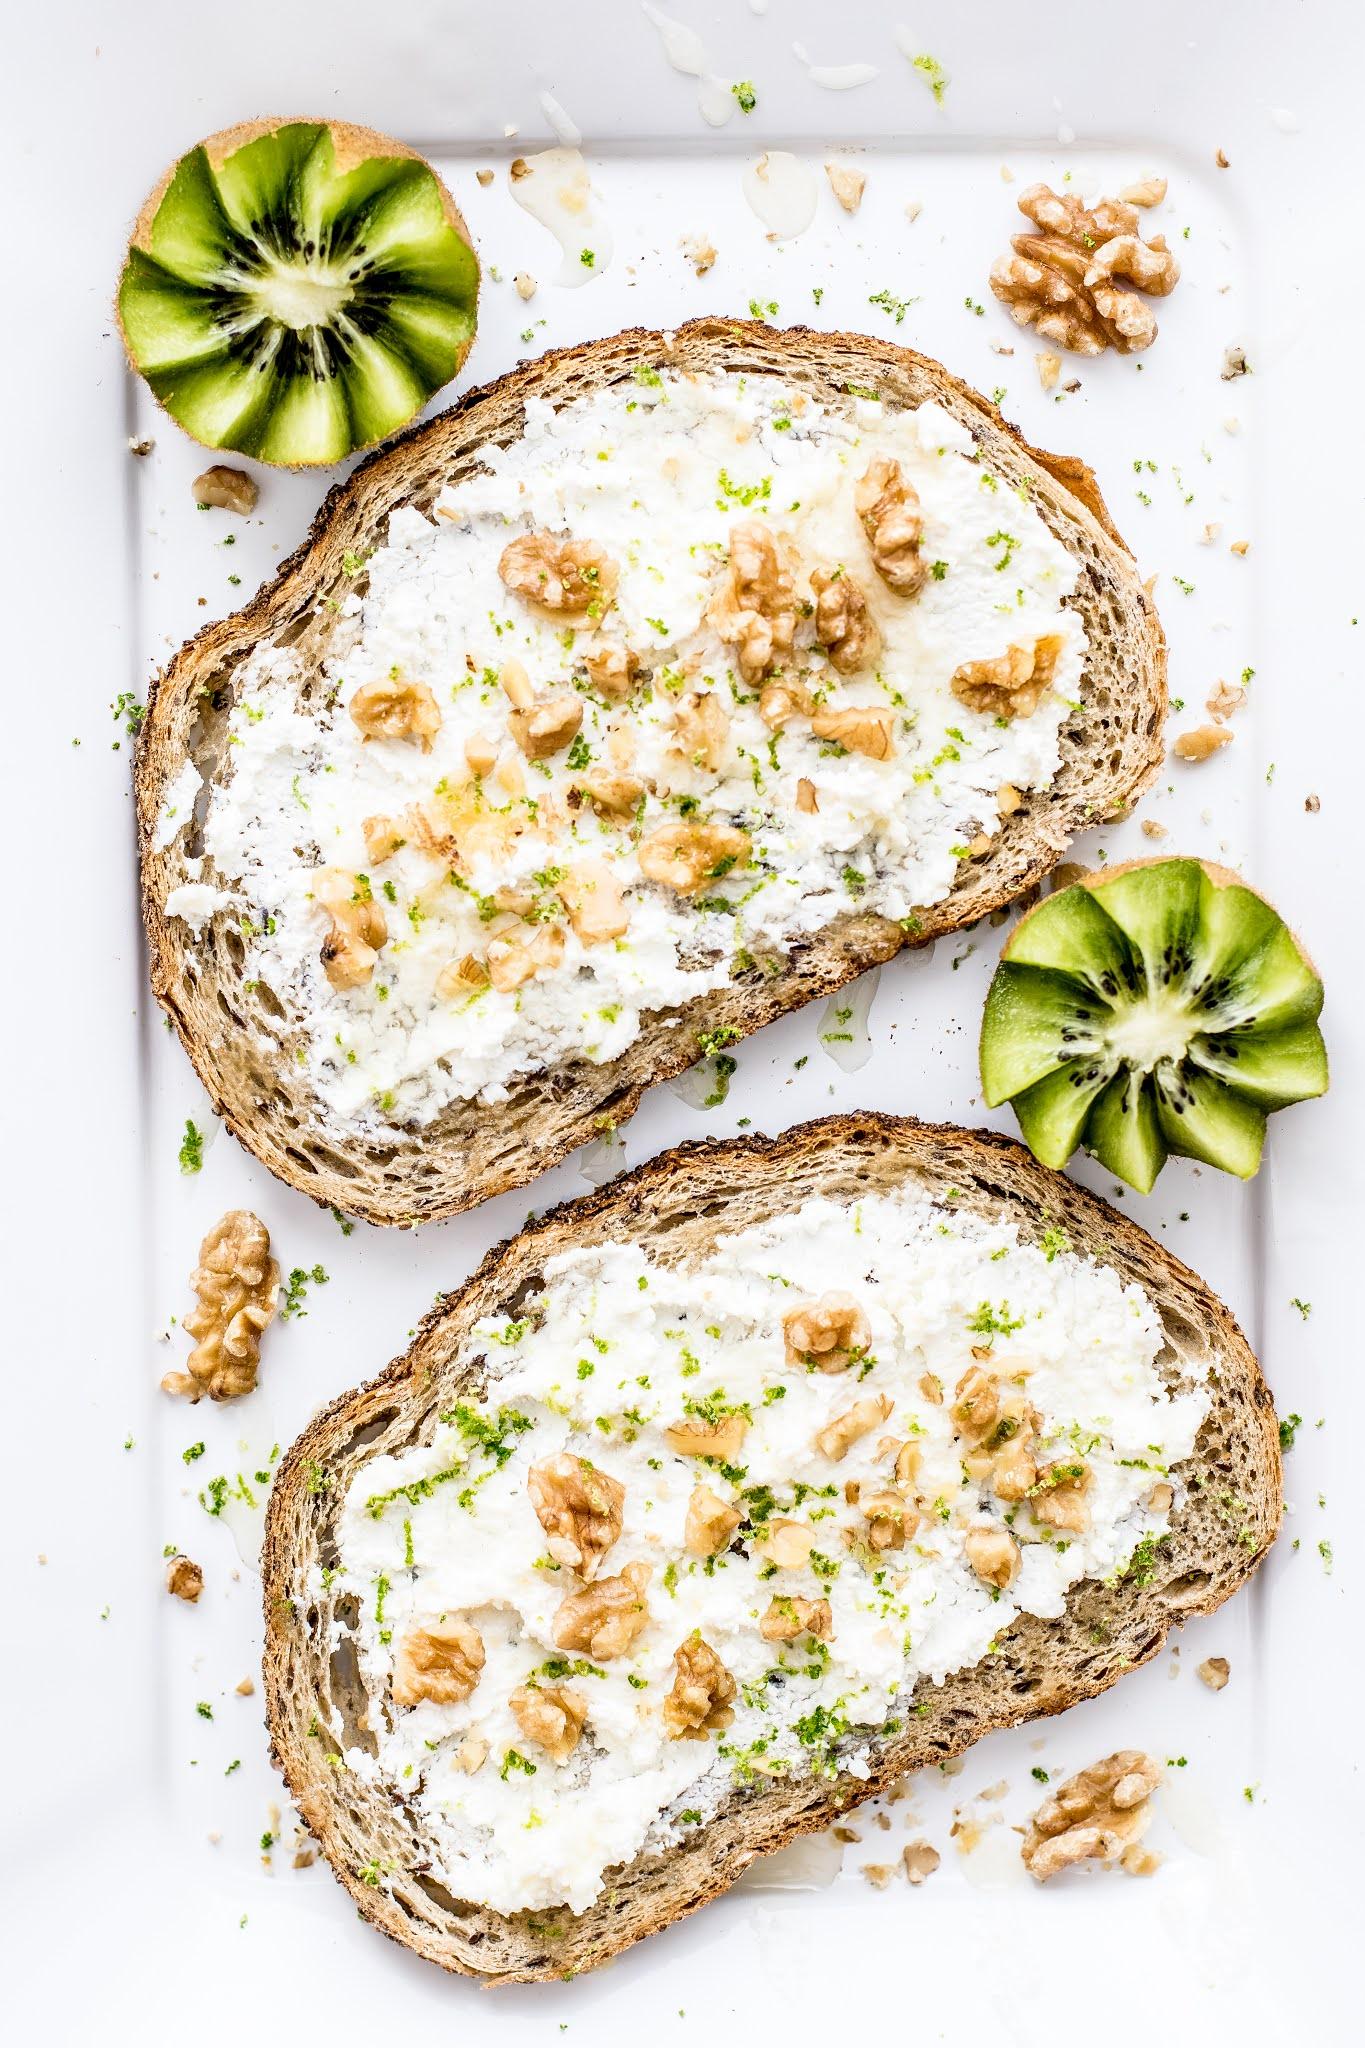 Copycat Panera Bread Honey Walnut Cream Cheese Spread